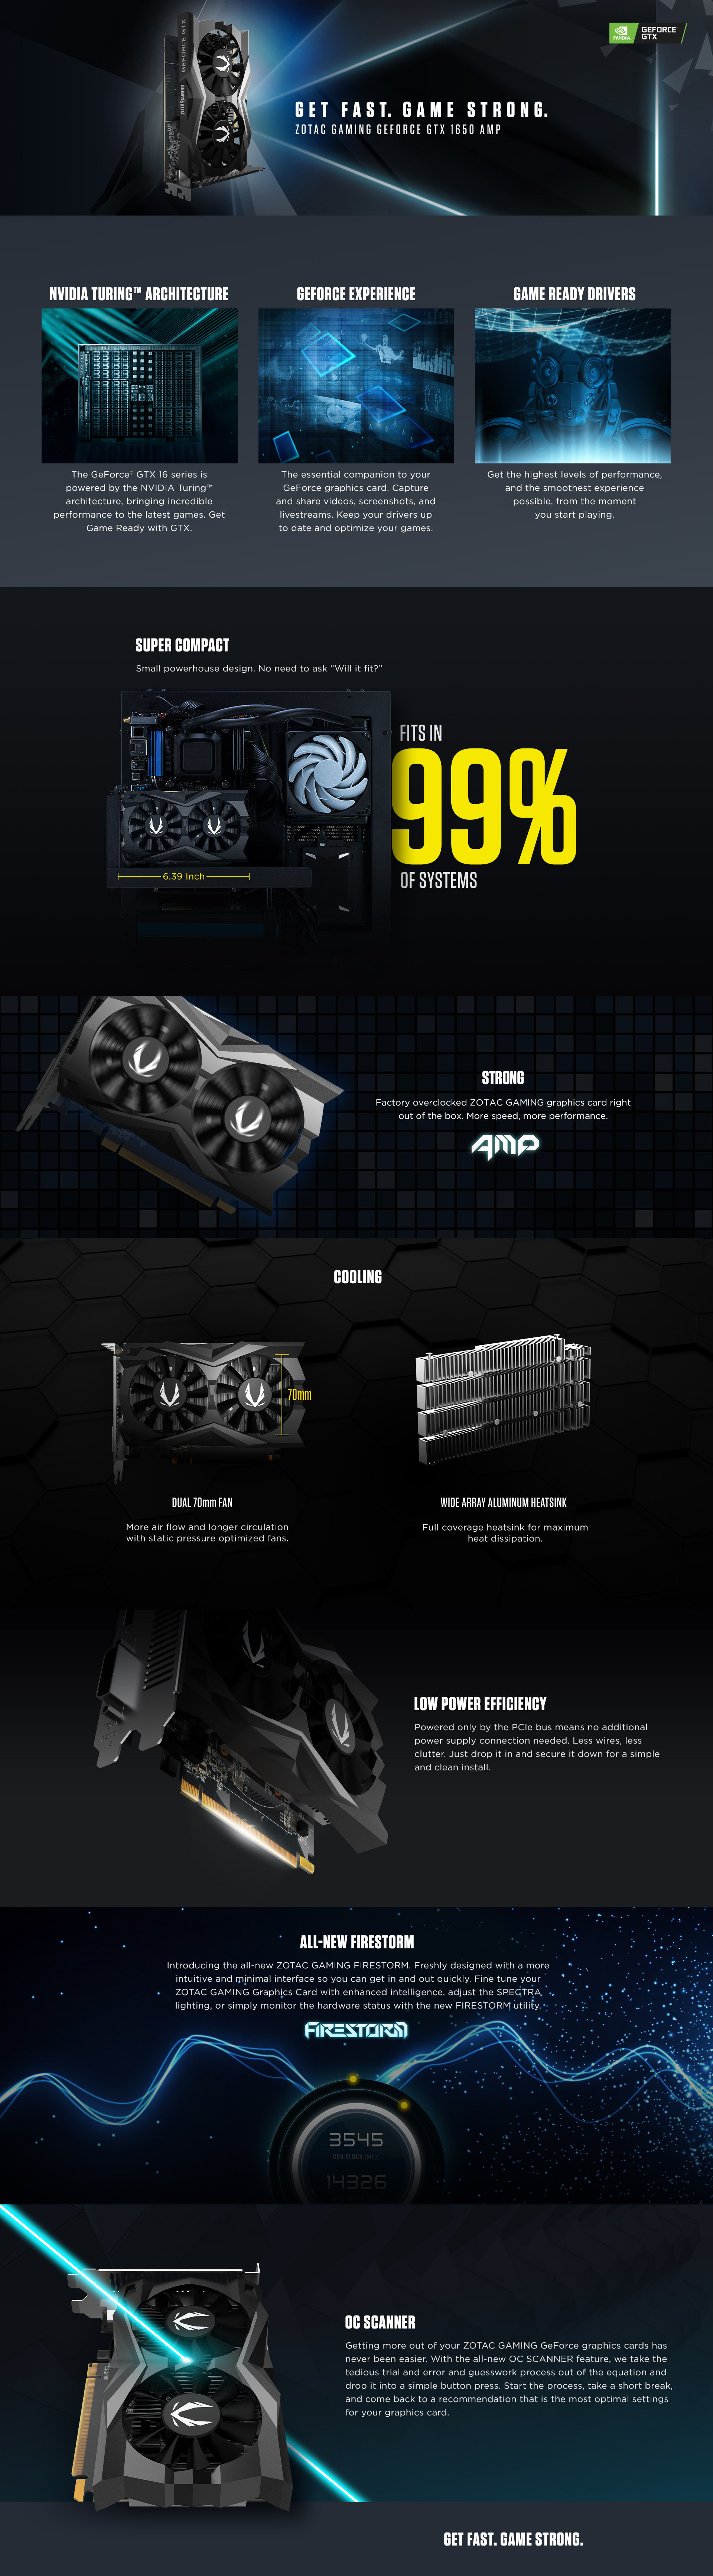 ZOTAC GAMING GeForce GTX 1650 AMP | ZOTAC